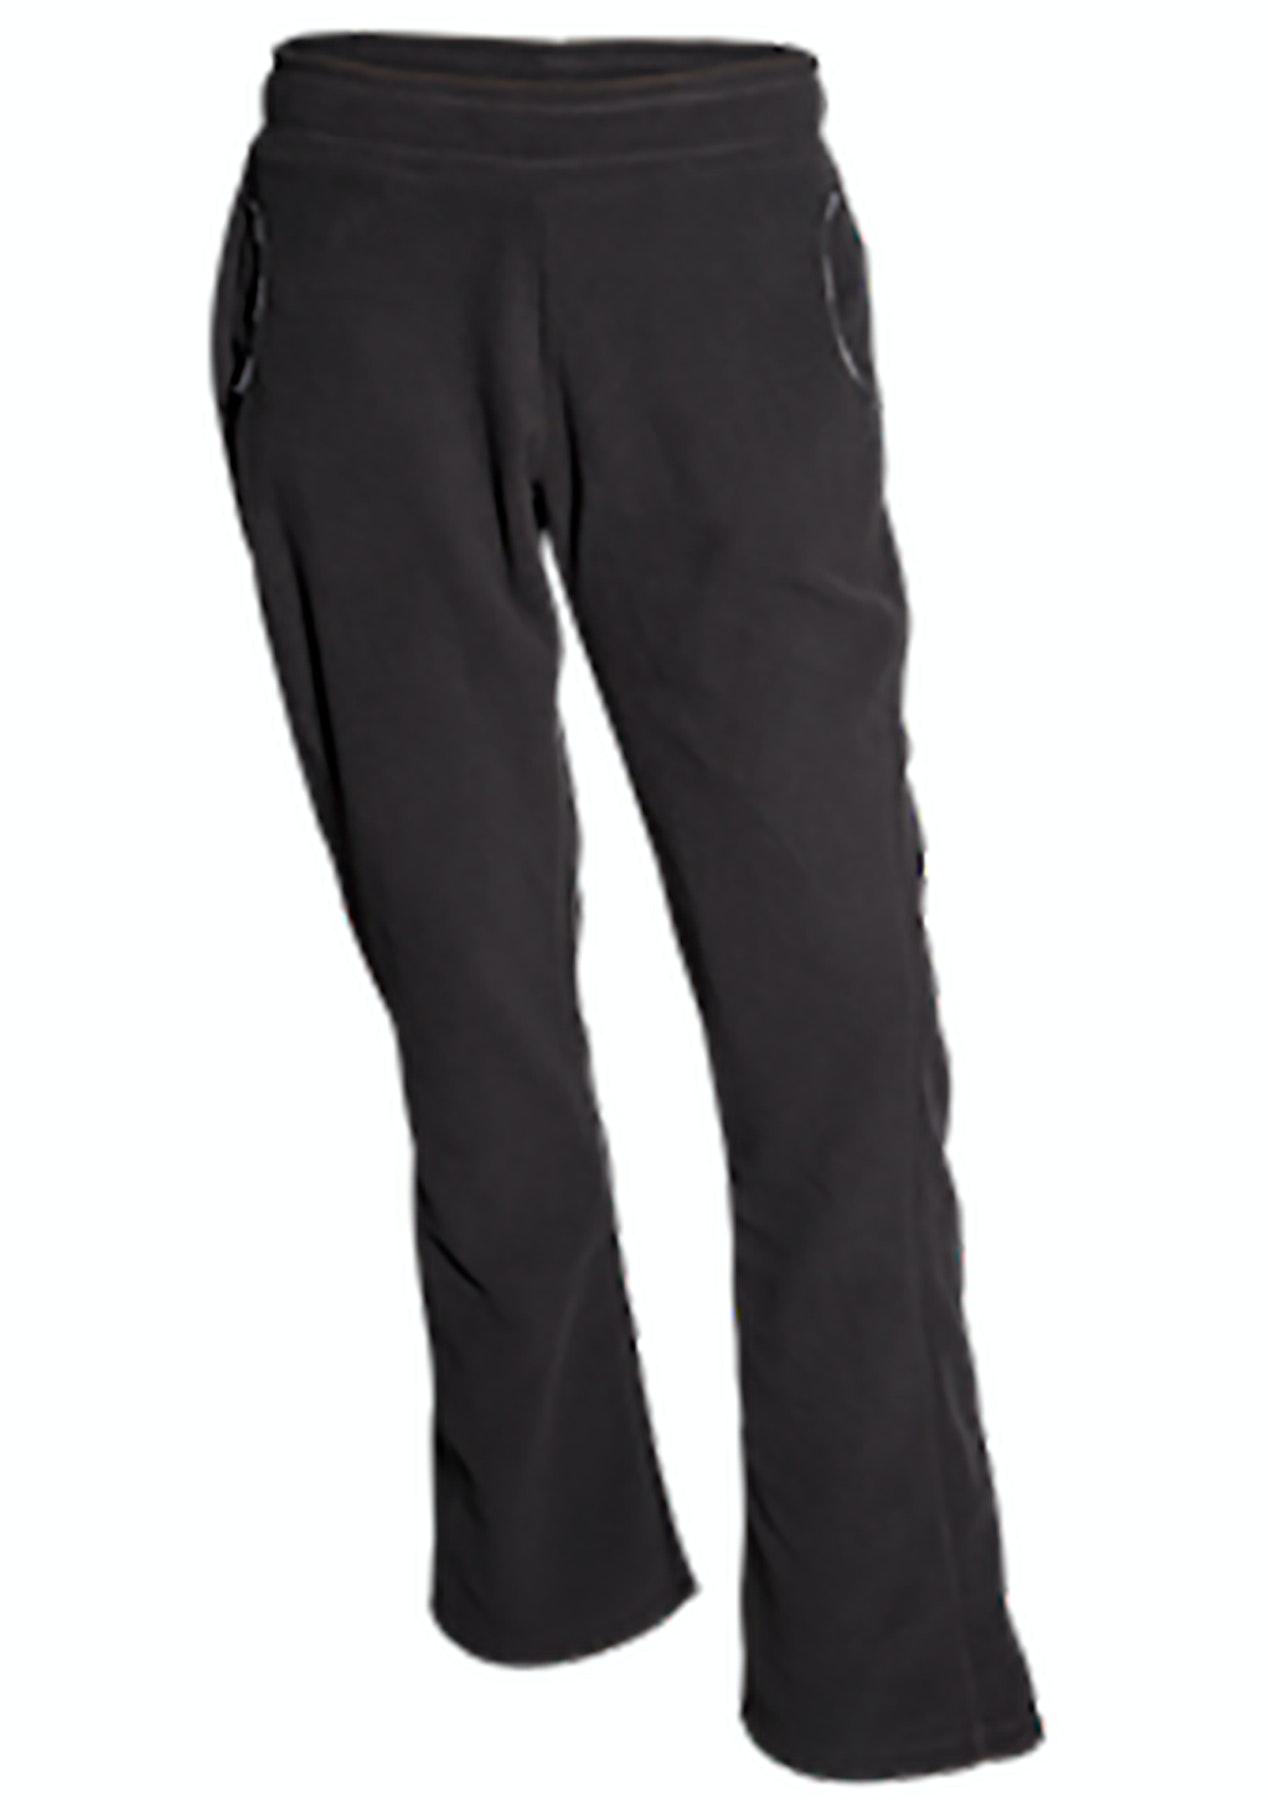 34eb3353 Ridgeline Womens Alpine Fleece Pants - Black - Ridgeline up to 66% off -  Onceit